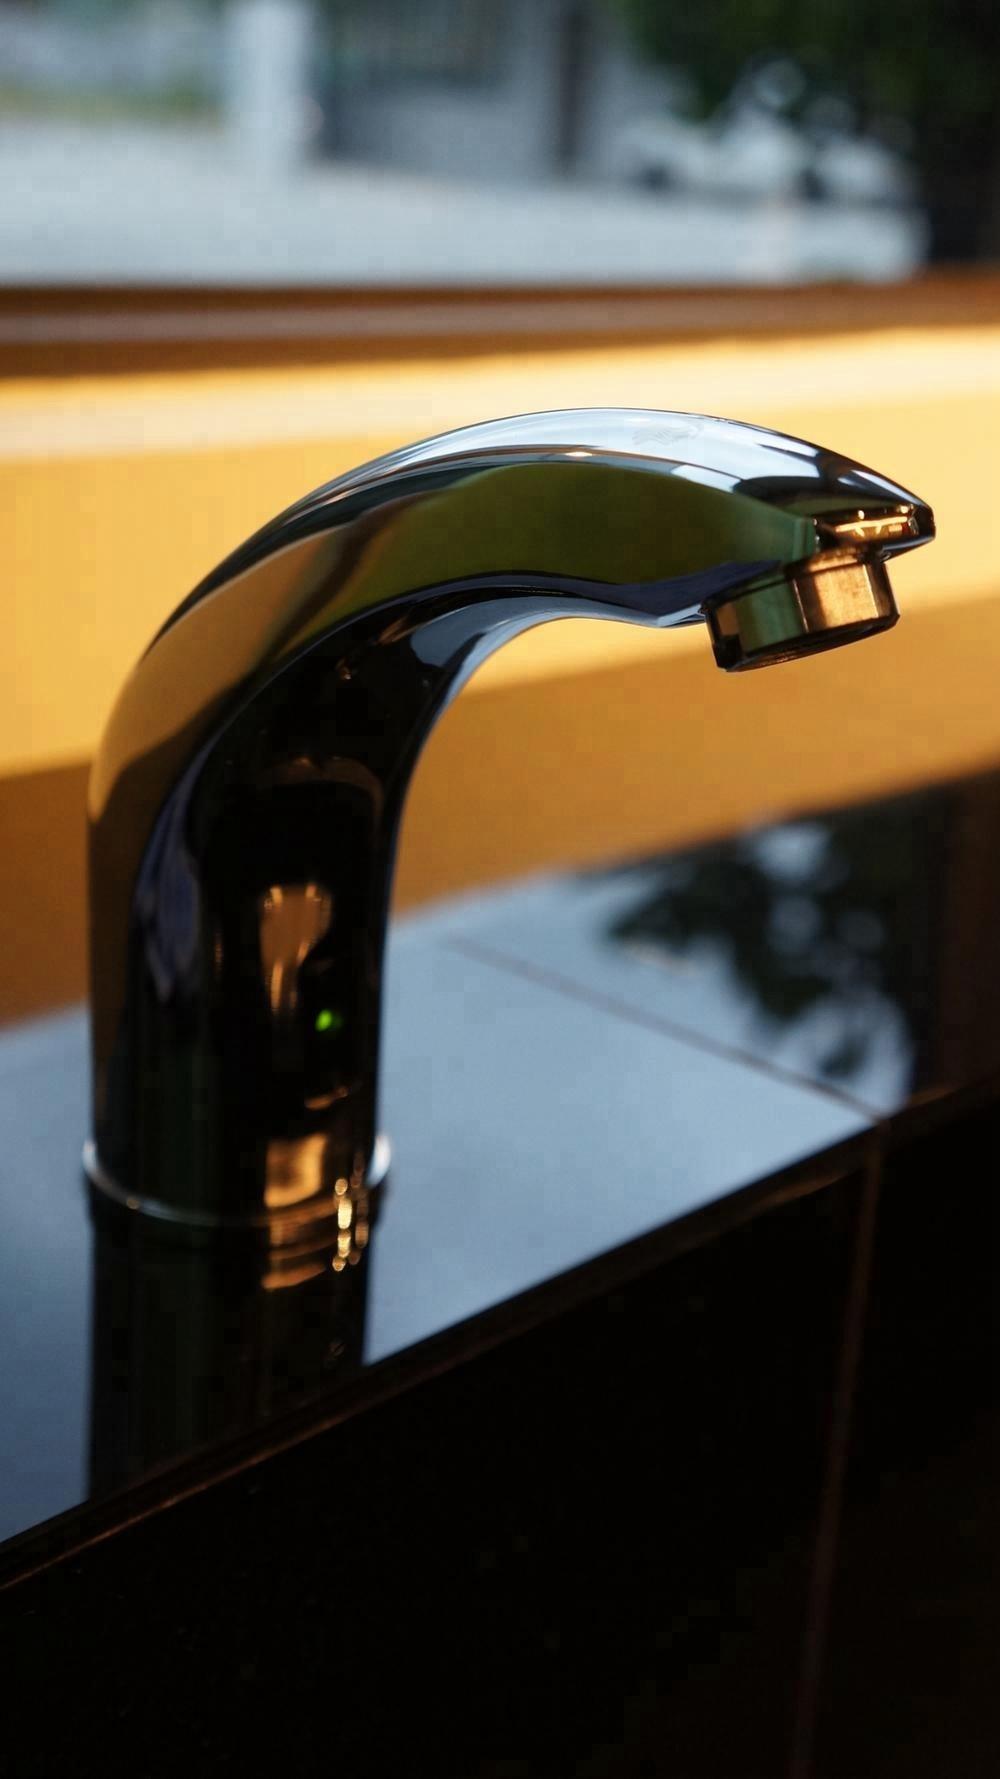 automatic smart bathroom sink faucet